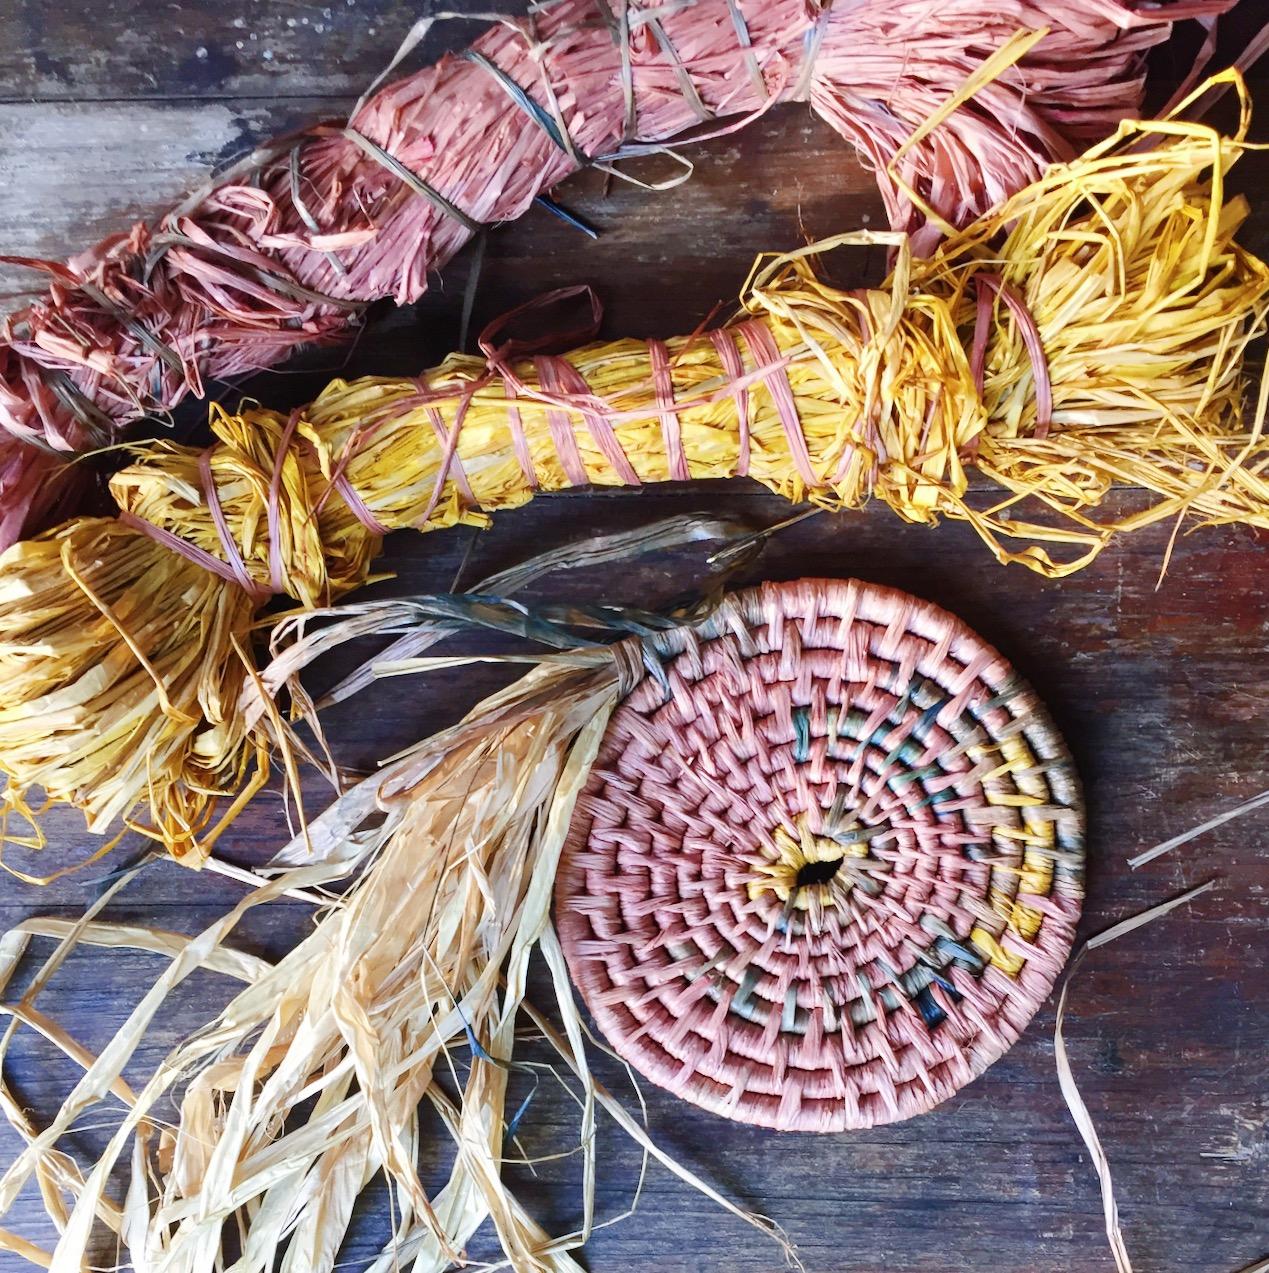 Ellie Beck raffia basket natural dye watercolour hues - craft as therapy716FFDDB-1EDA-4A41-8337-B4F71228E619.JPG